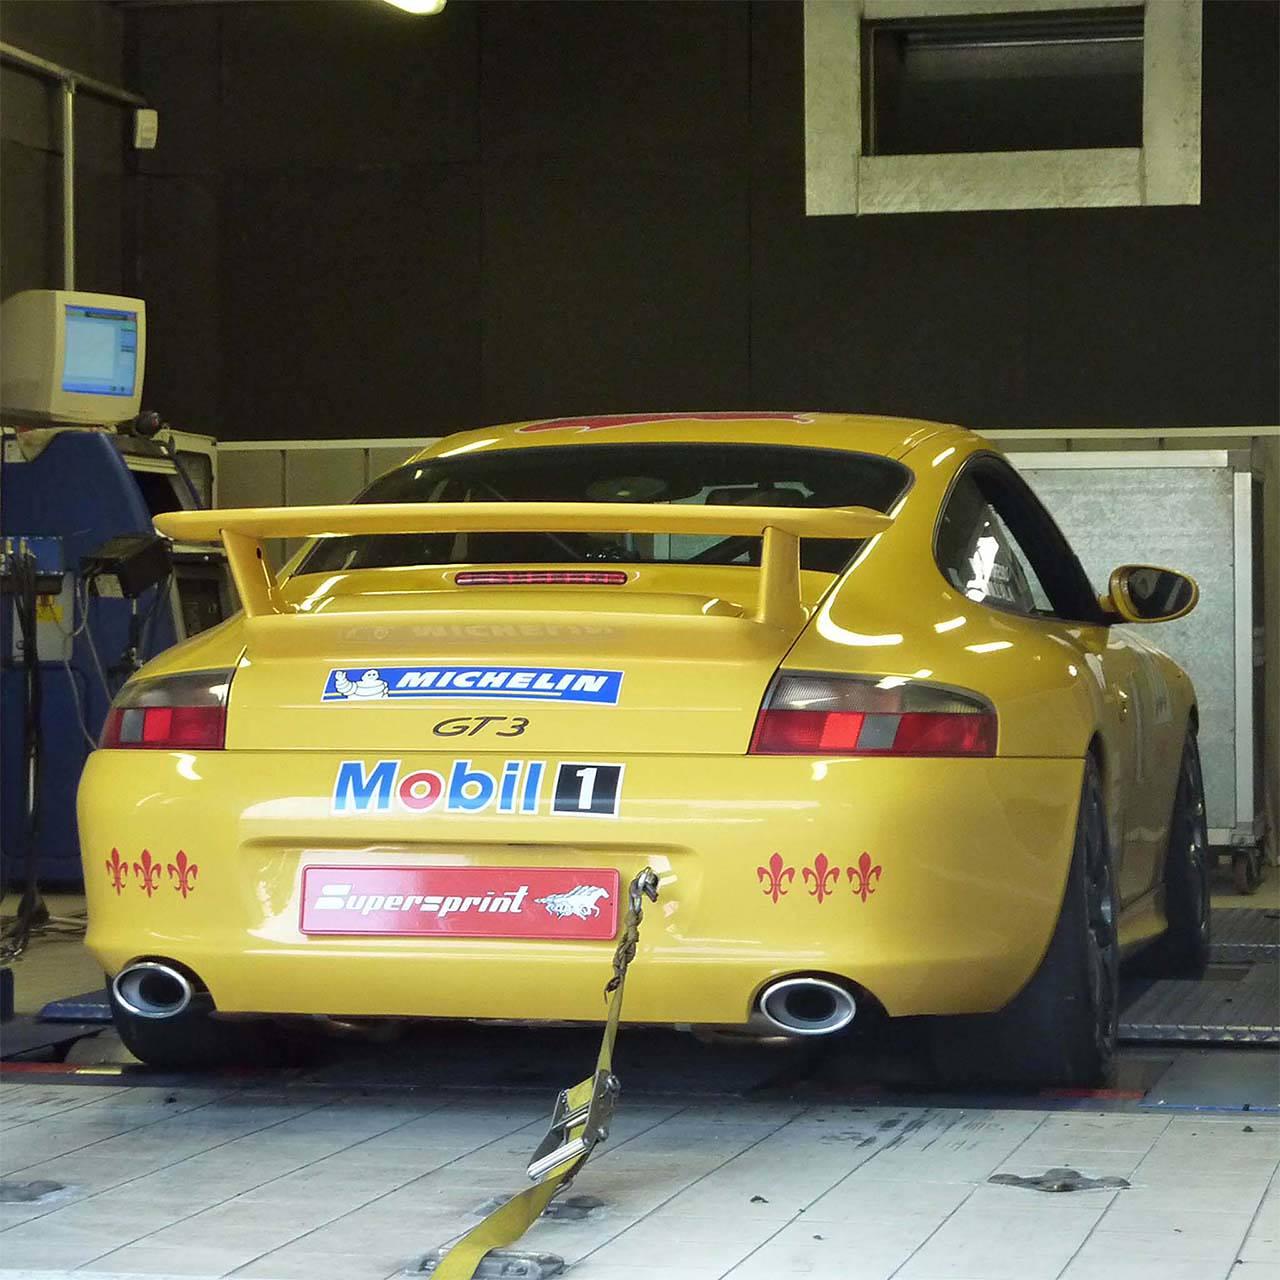 Porsche 996 Aftermarket Exhaust: Performance Sport Exhaust For PORSCHE 911 996 GT3, PORSCHE